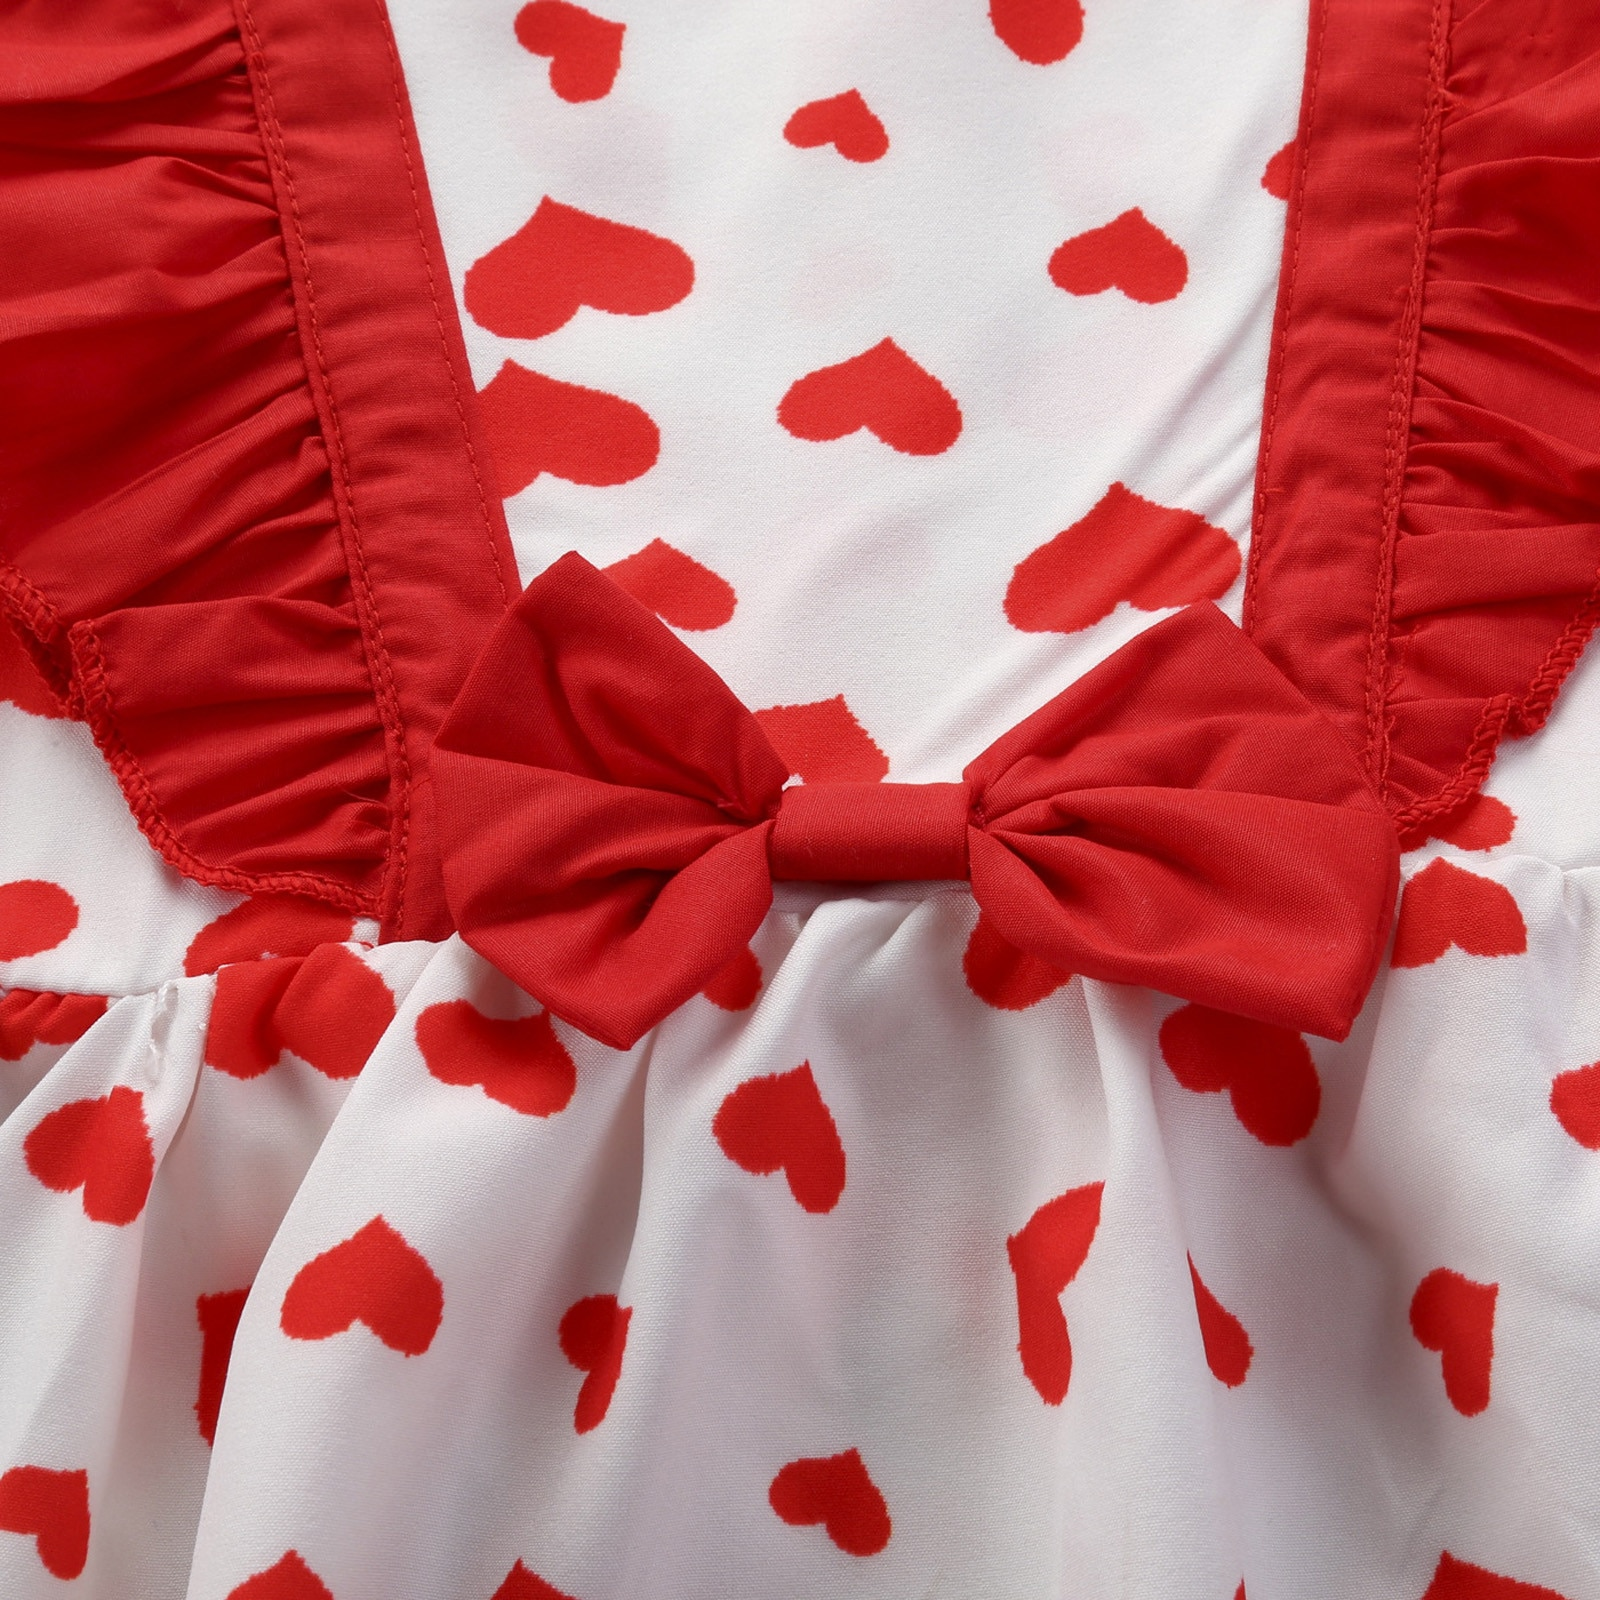 Toddler Kids Baby Girls Sleeveless Bow Love Print Dress Clothes платье для девочки Summer Baby Girl Dress ropa bebe niña